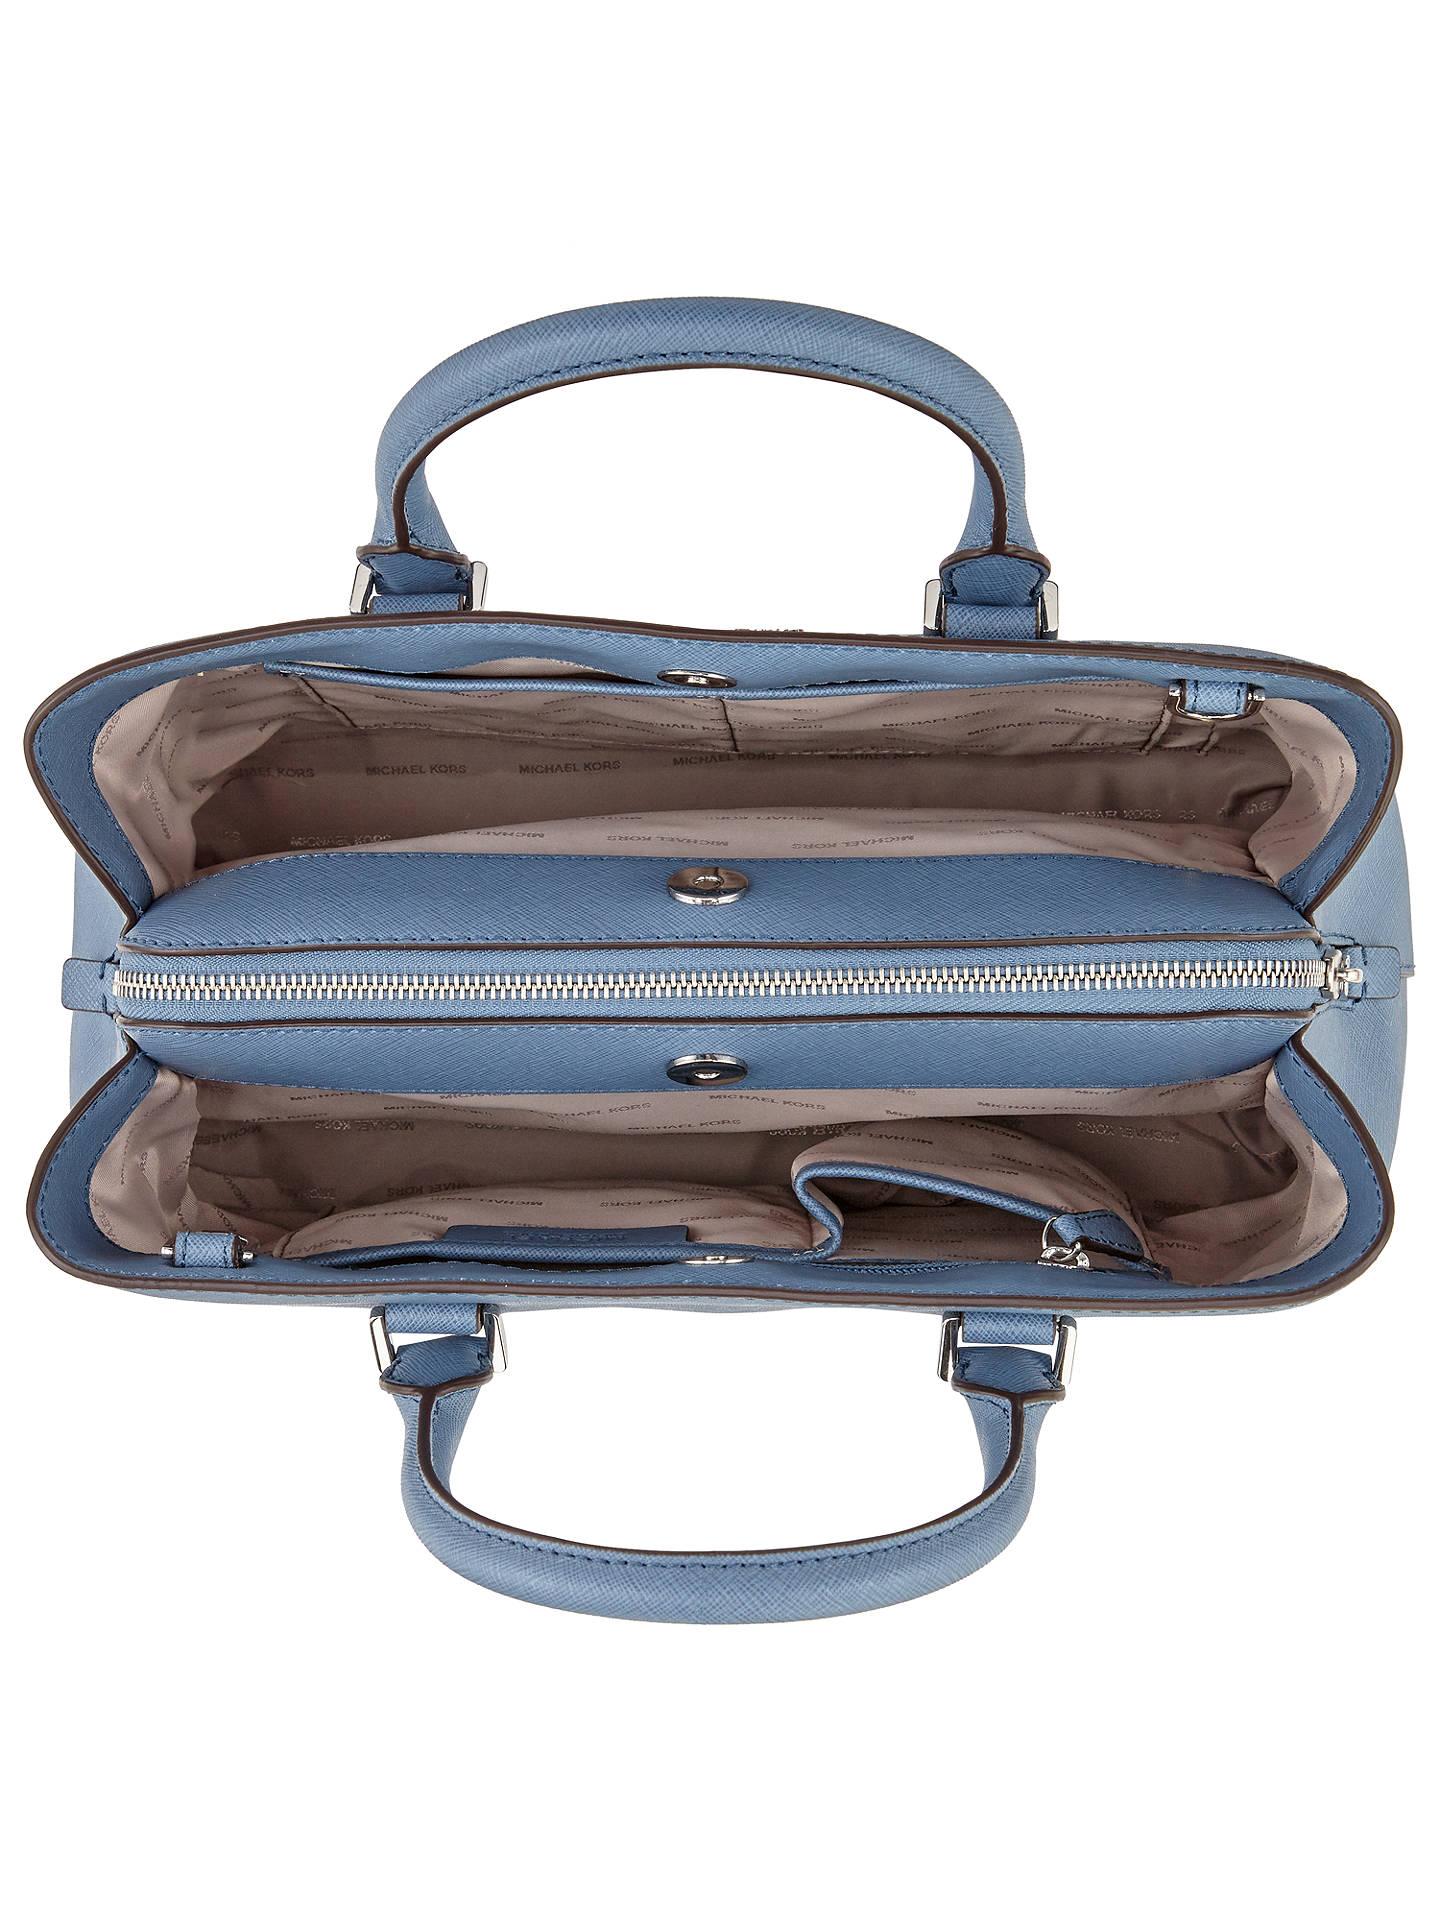 a1ab367f742c ... Buy MICHAEL Michael Kors Savannah Large Leather Satchel, Denim Online  at johnlewis.com ...